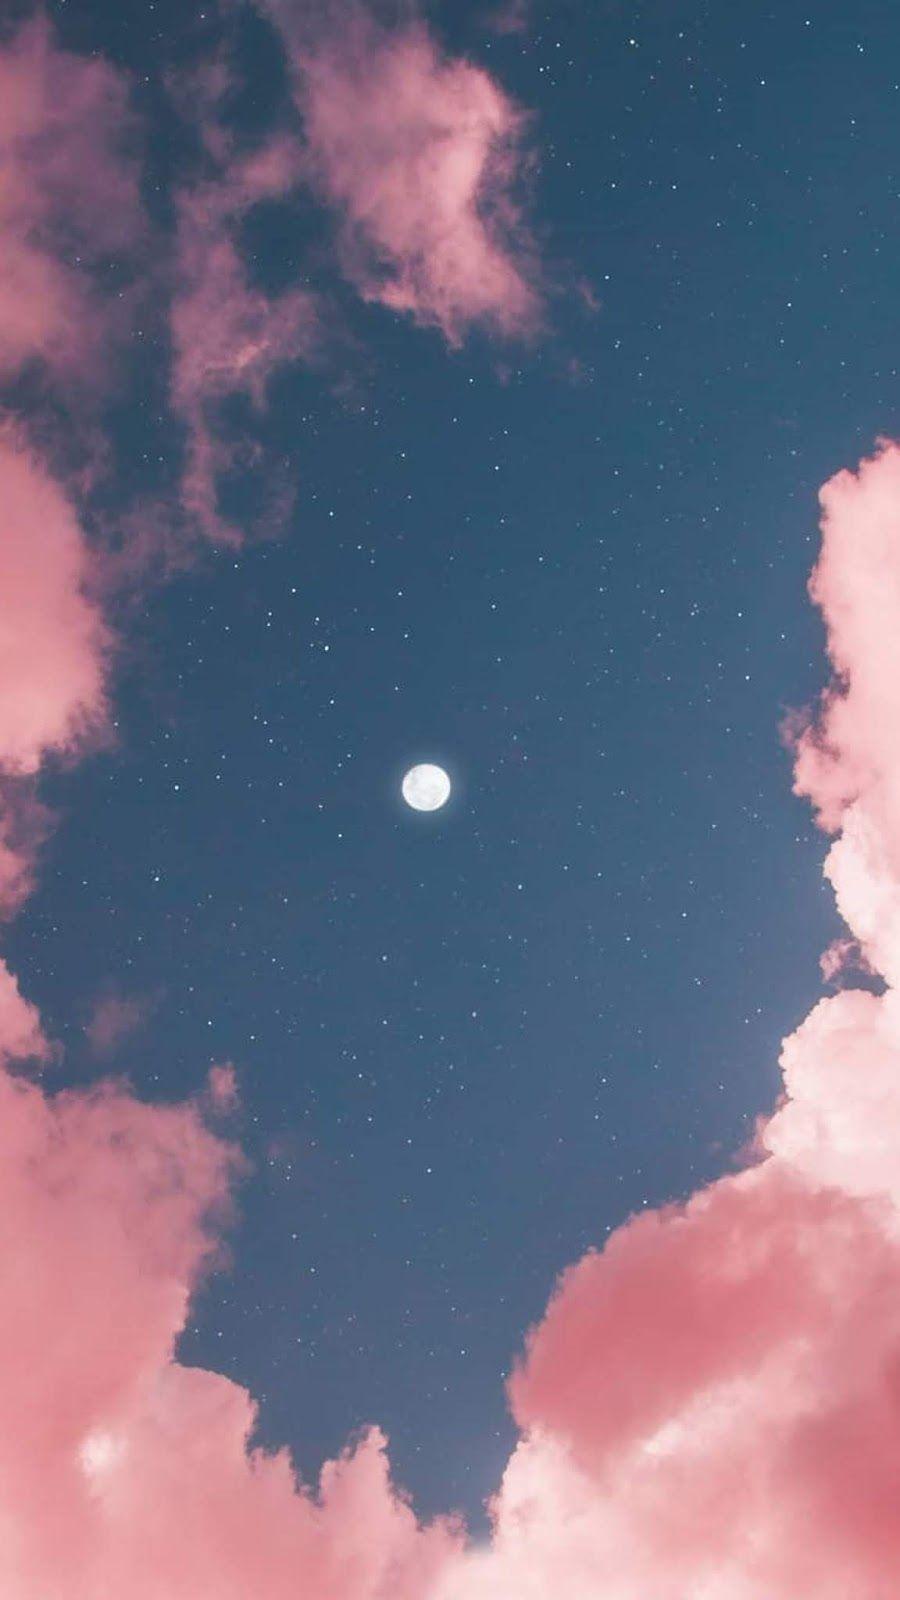 Full Moon In Pink Sky By Matialonsor Latar Belakang Wallpaper